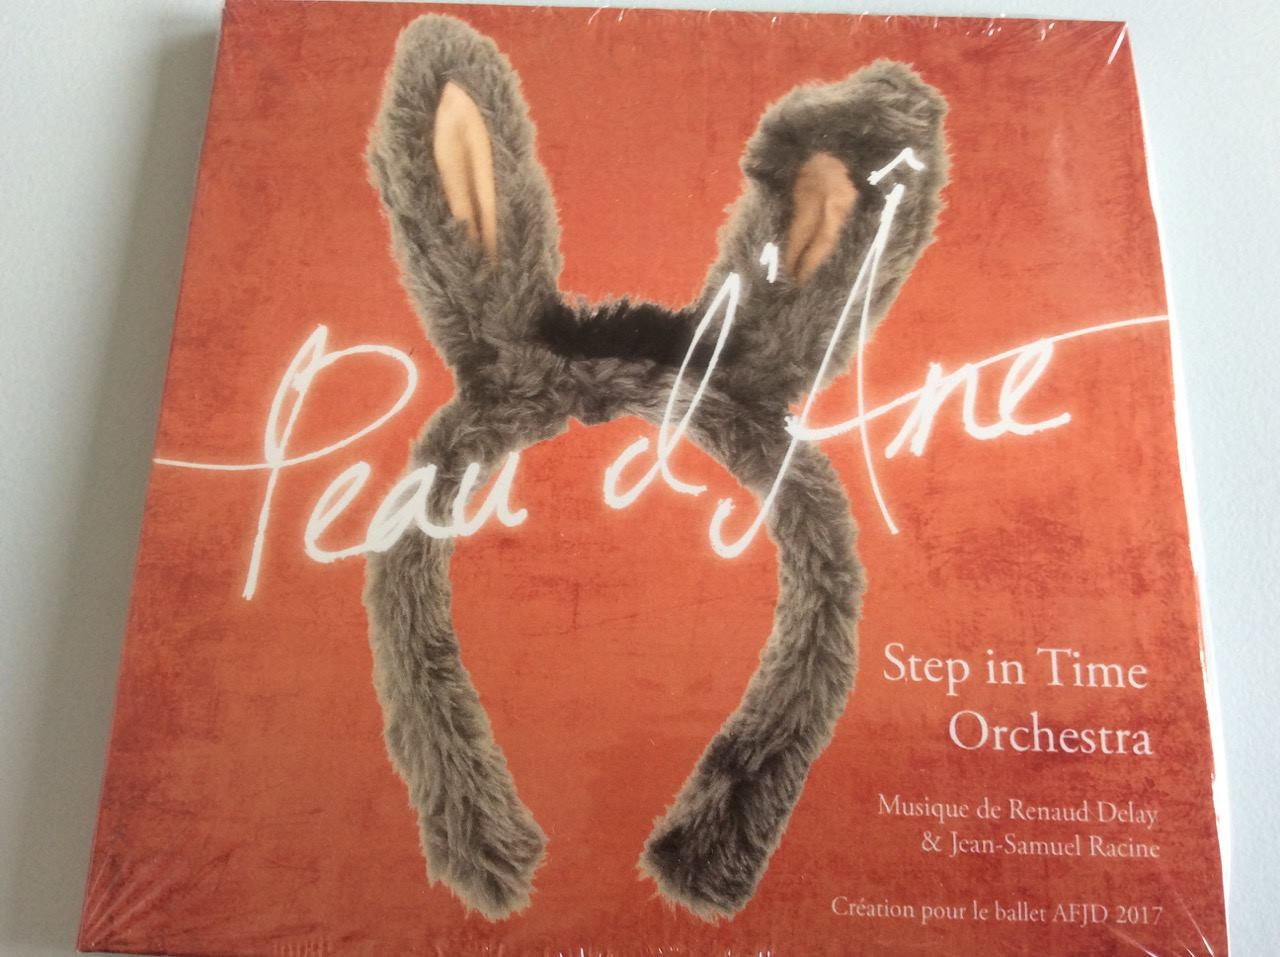 CD Peau d'Âne